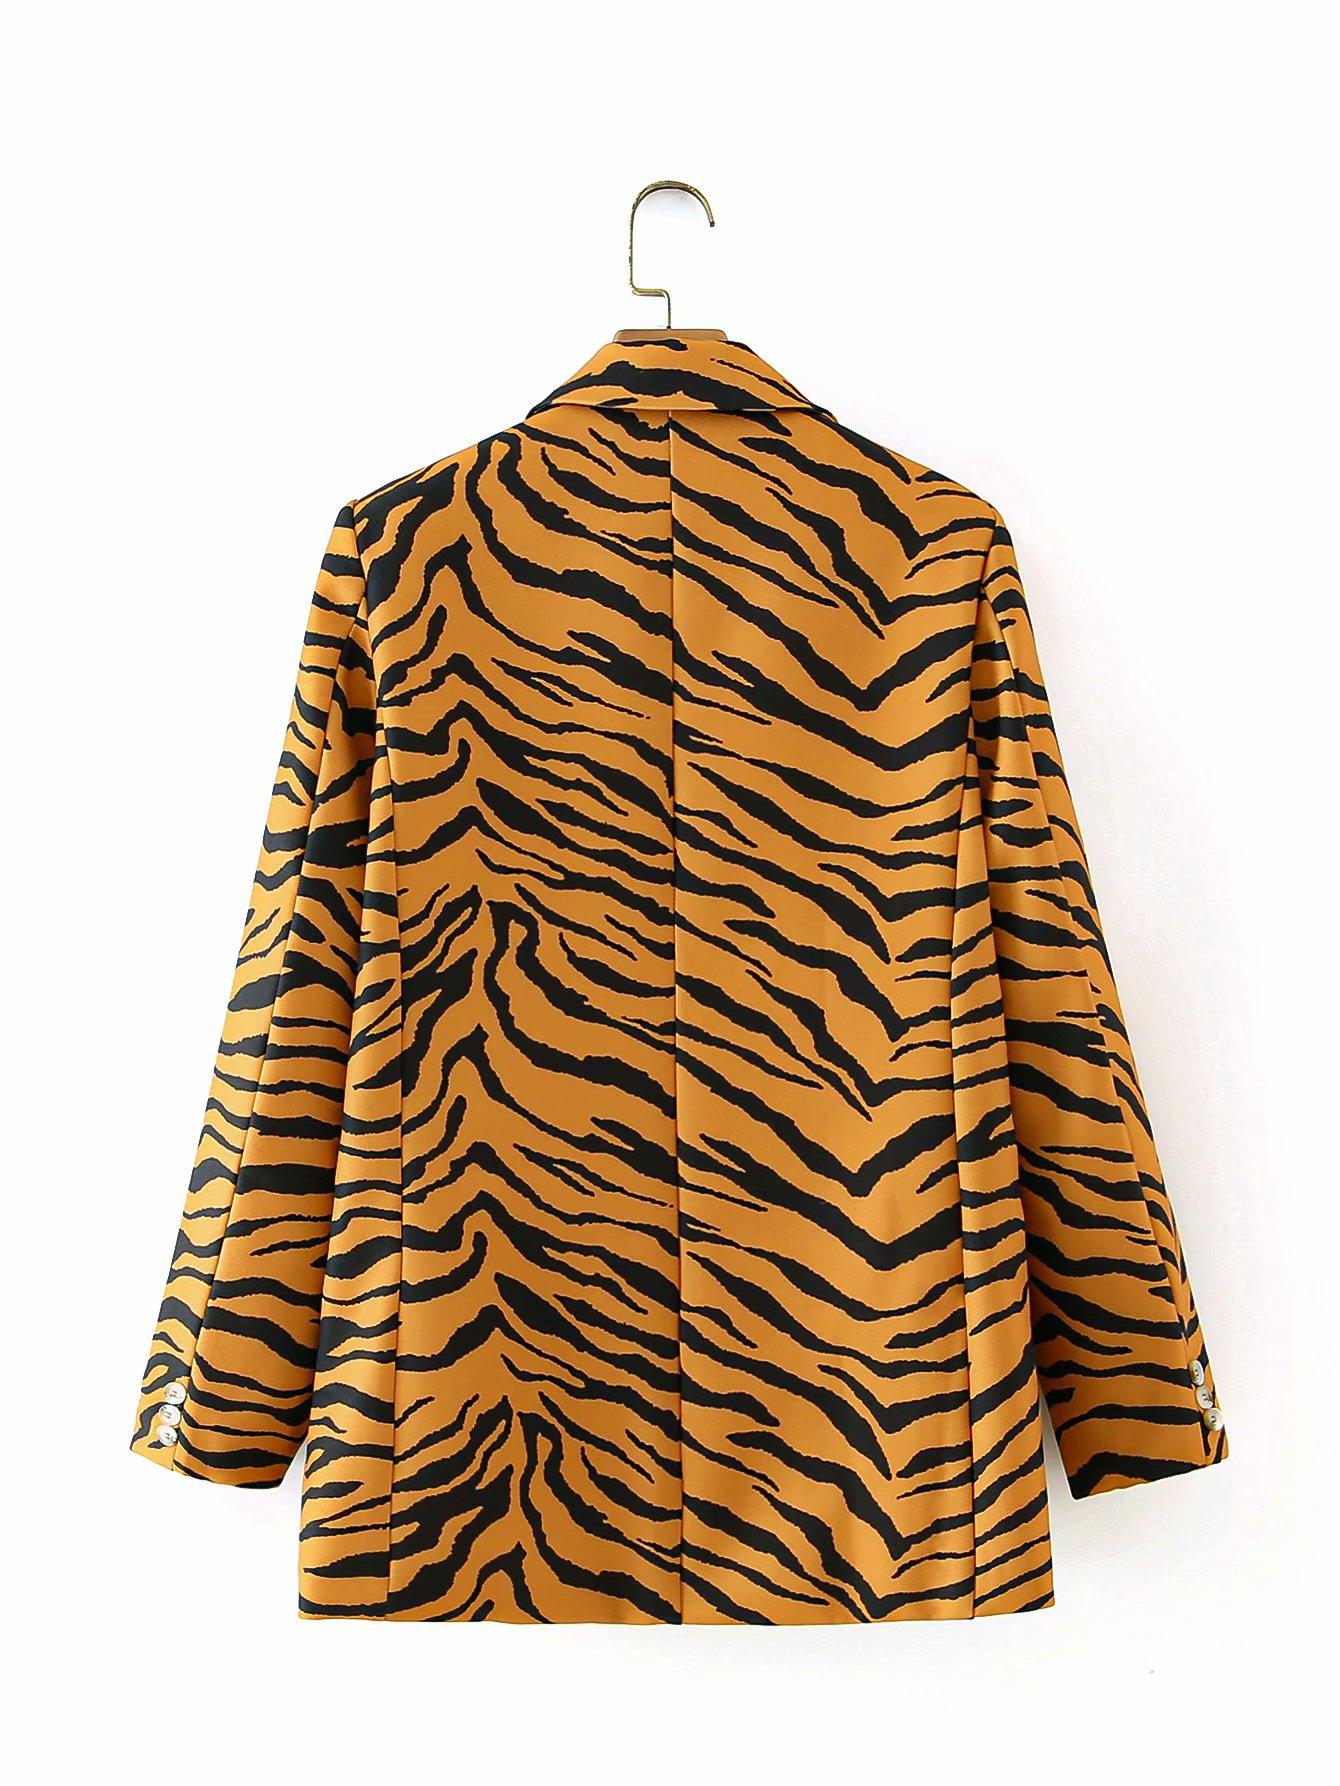 wholesale fashion women's new tiger pattern one button suit jacket  NHAM255660